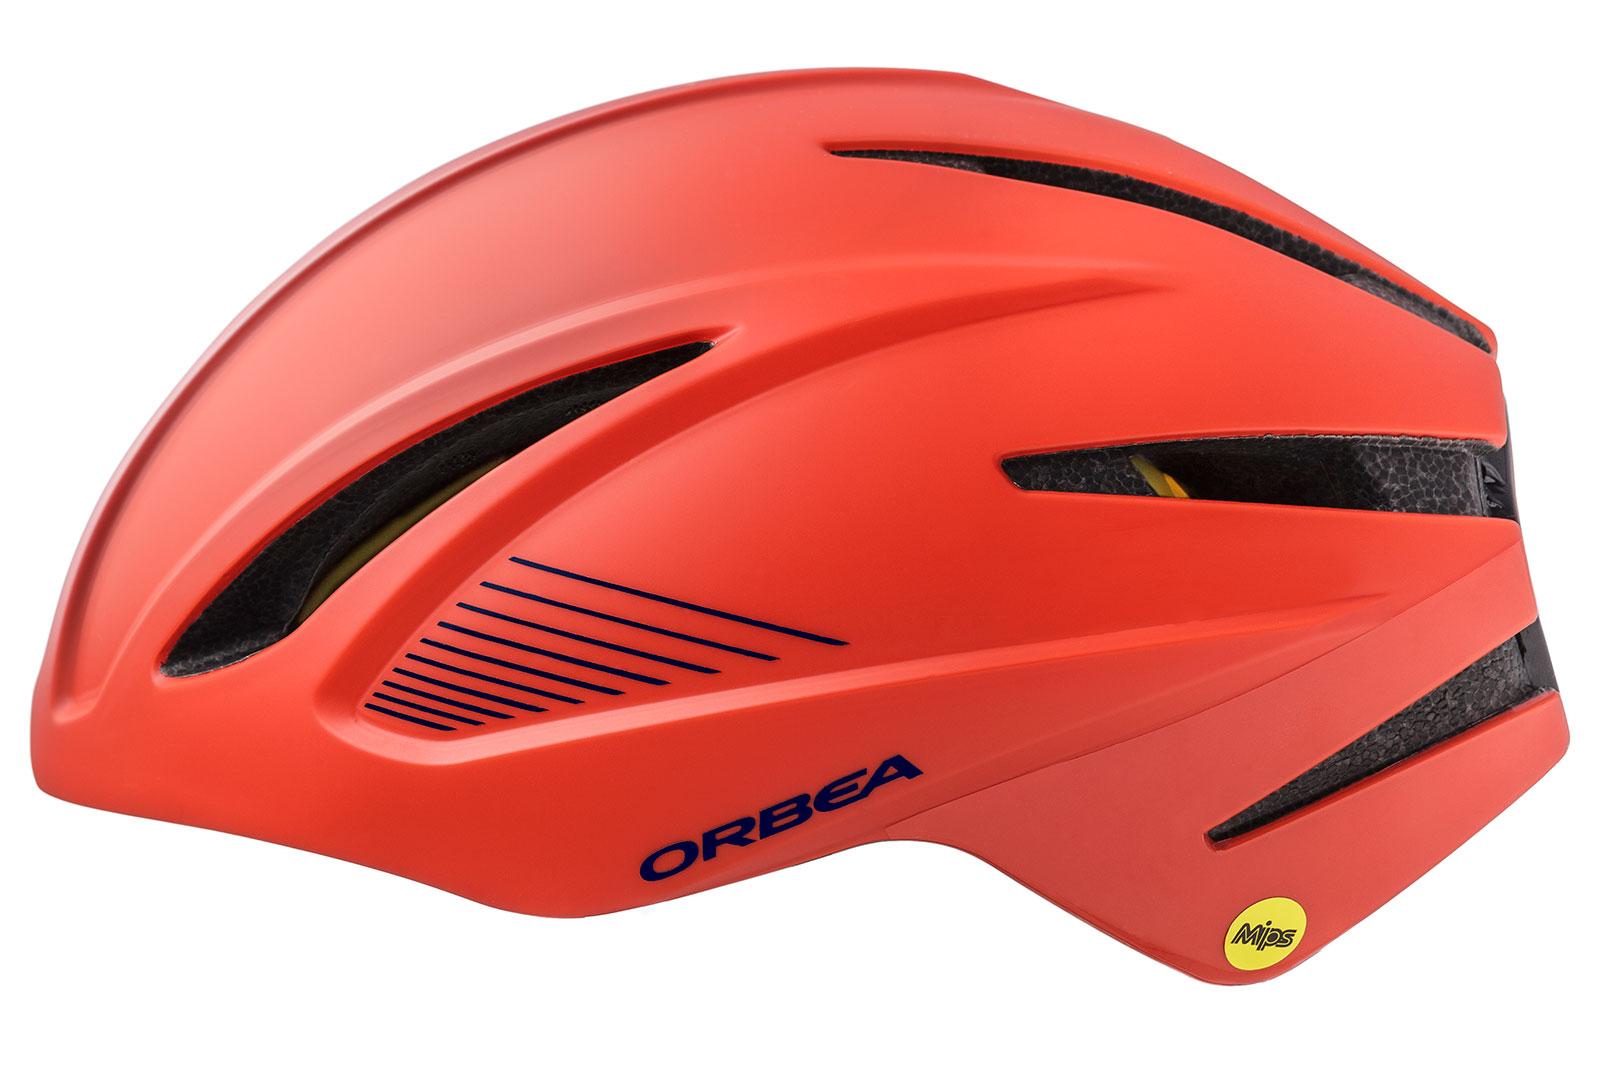 Casco Orbea R10 Mips Red